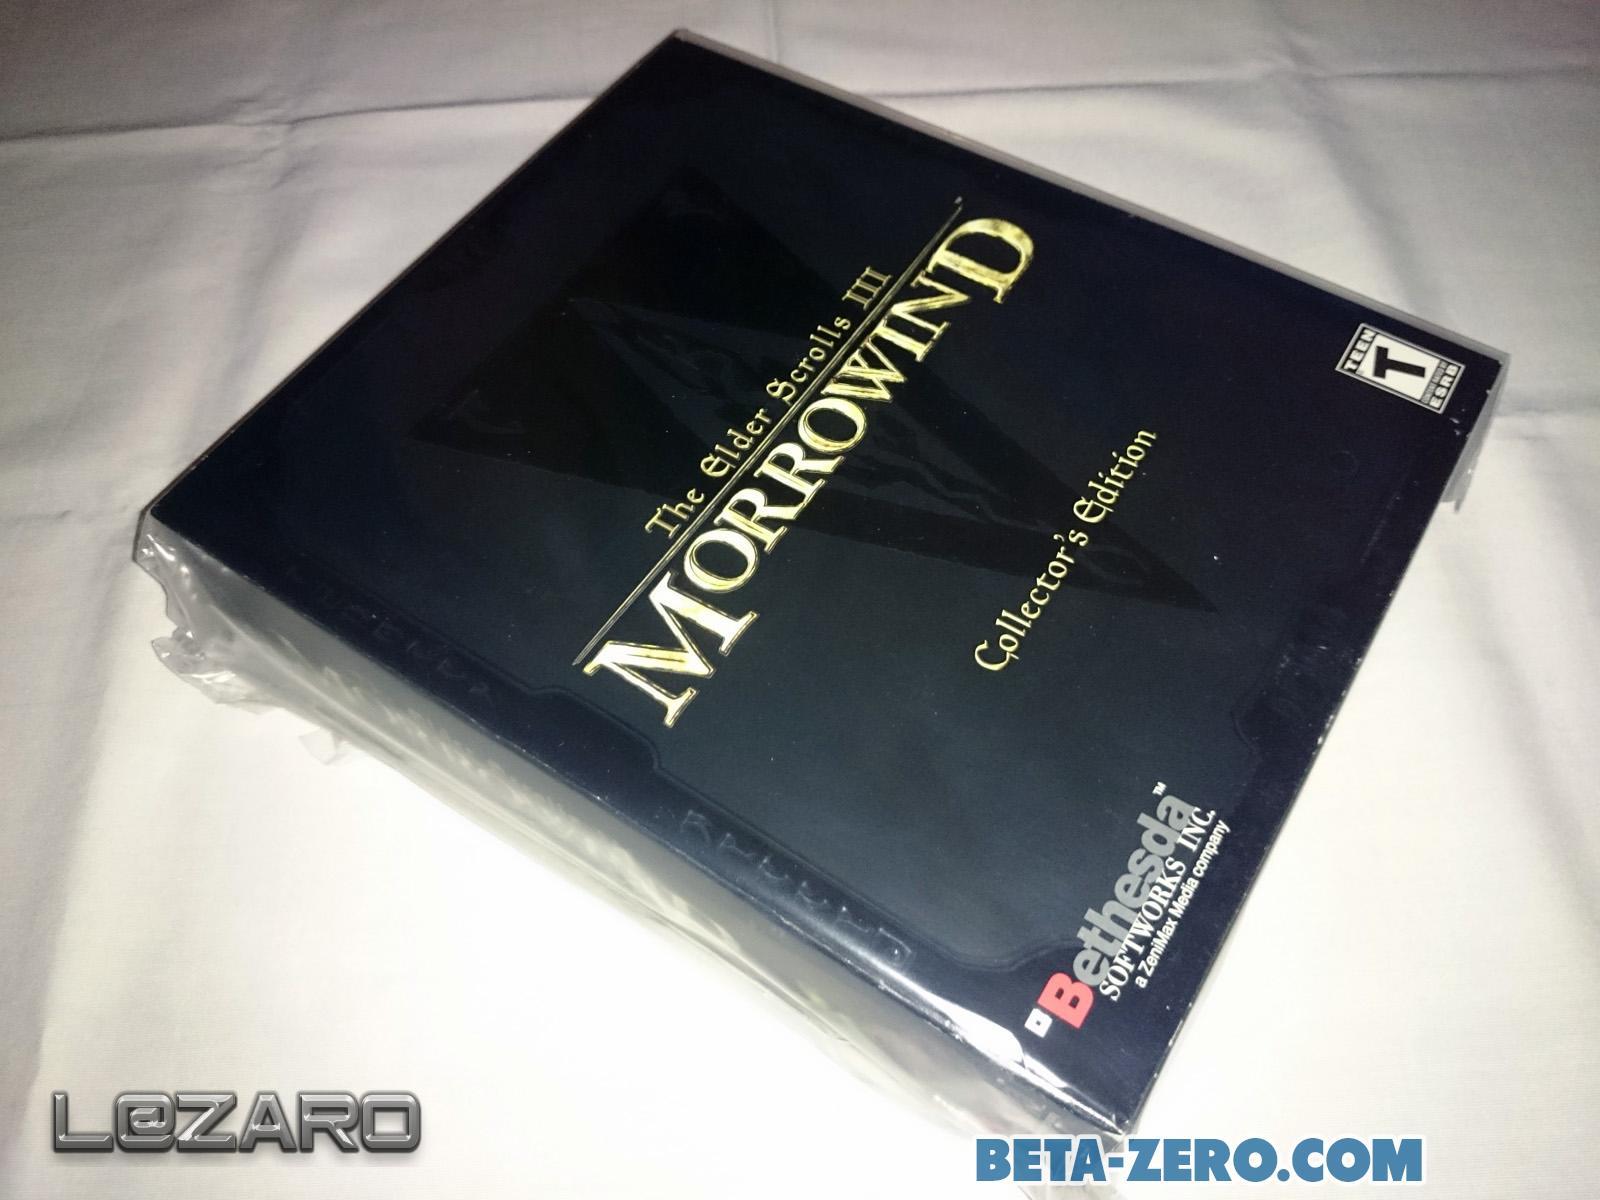 The Elder Scrolls III: Morrowind Collector's Edition USA